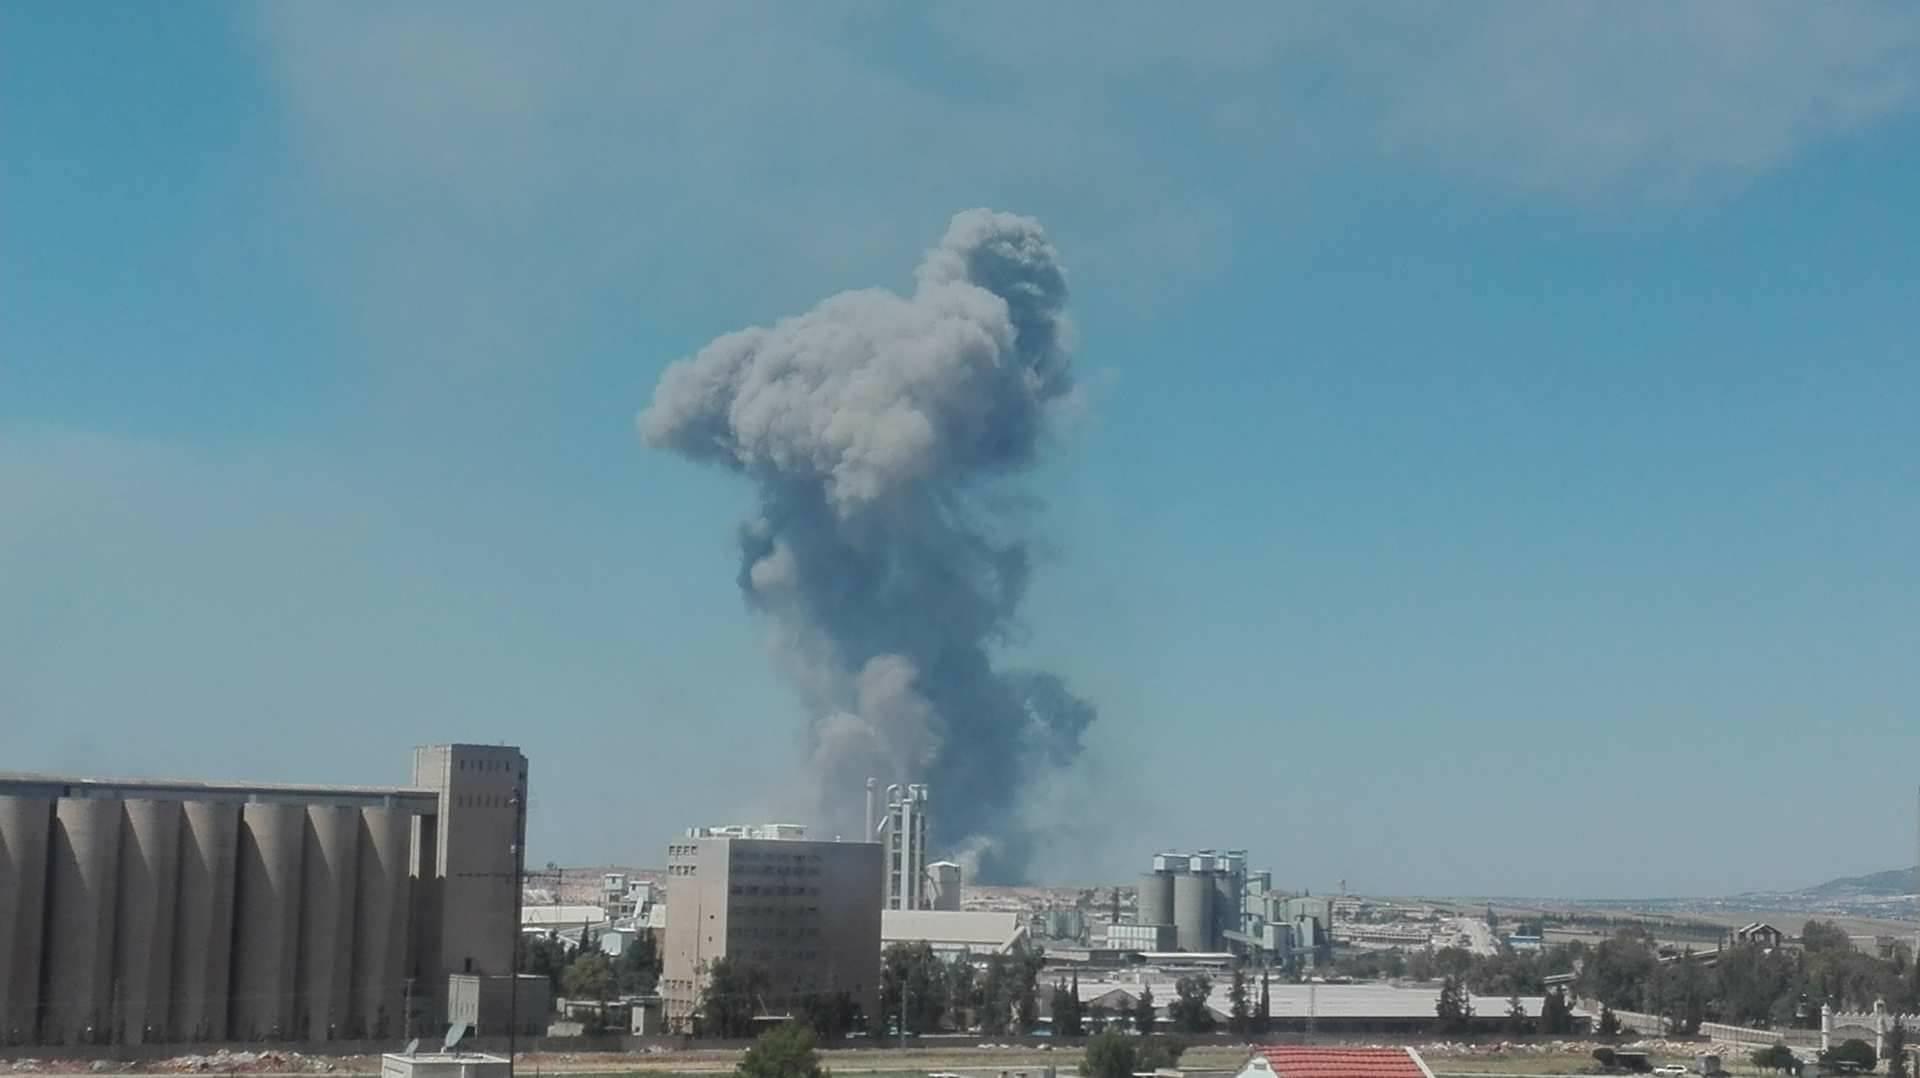 Hezbollah Media: No Iranians Were Killed In Hama Airbase Explosions